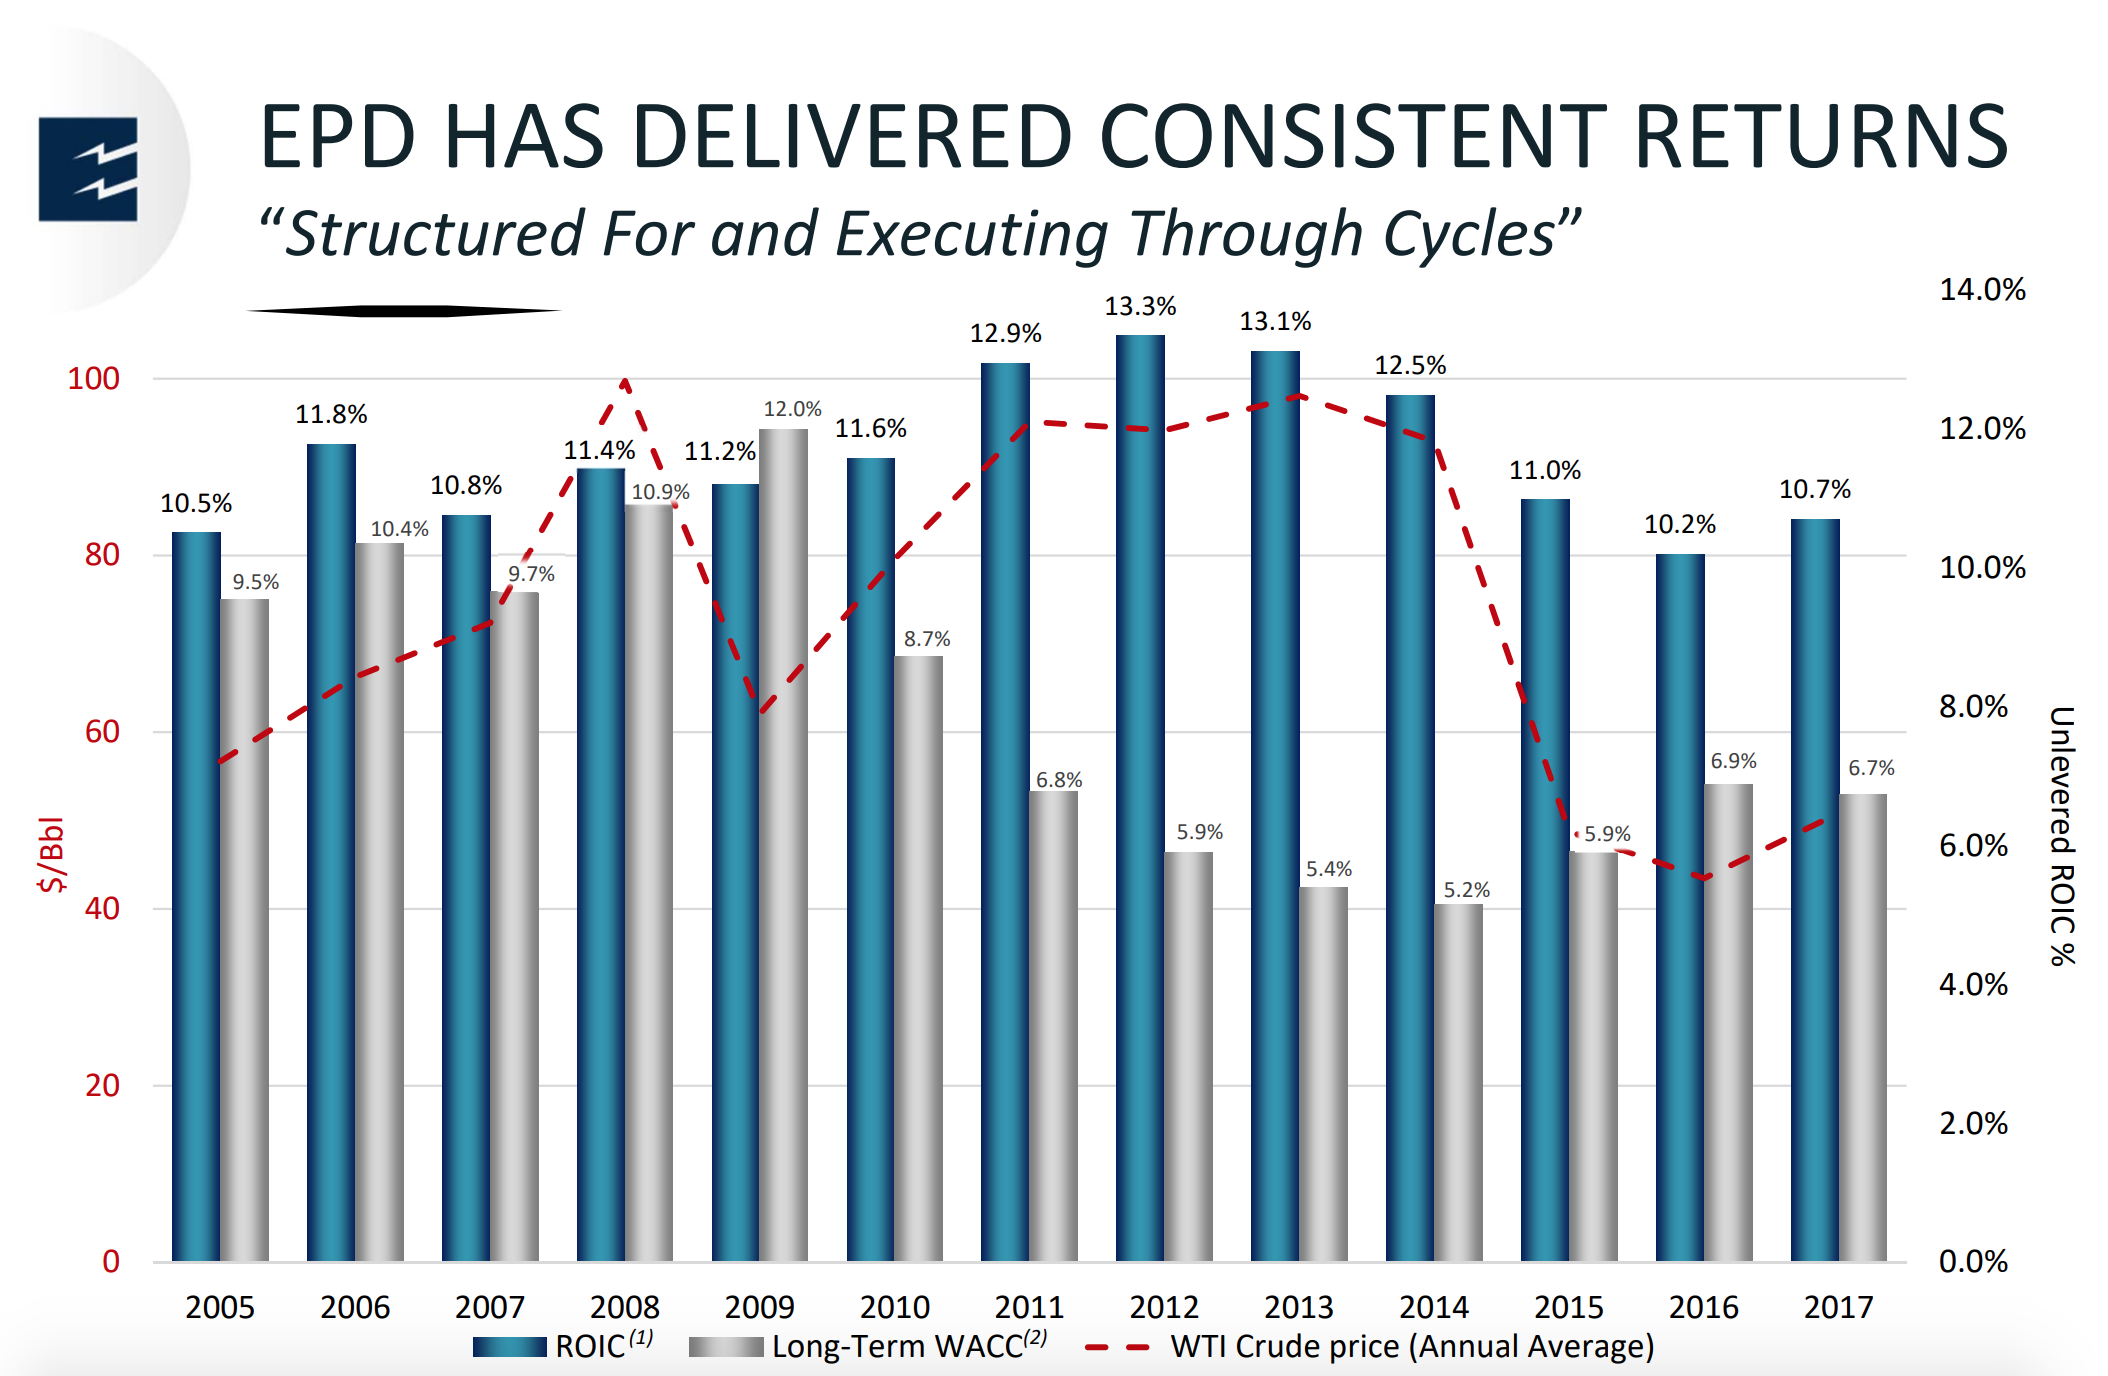 MLPs: Value Trap Or Unnecessarily Cheap? - JPMorgan Alerian MLP ...